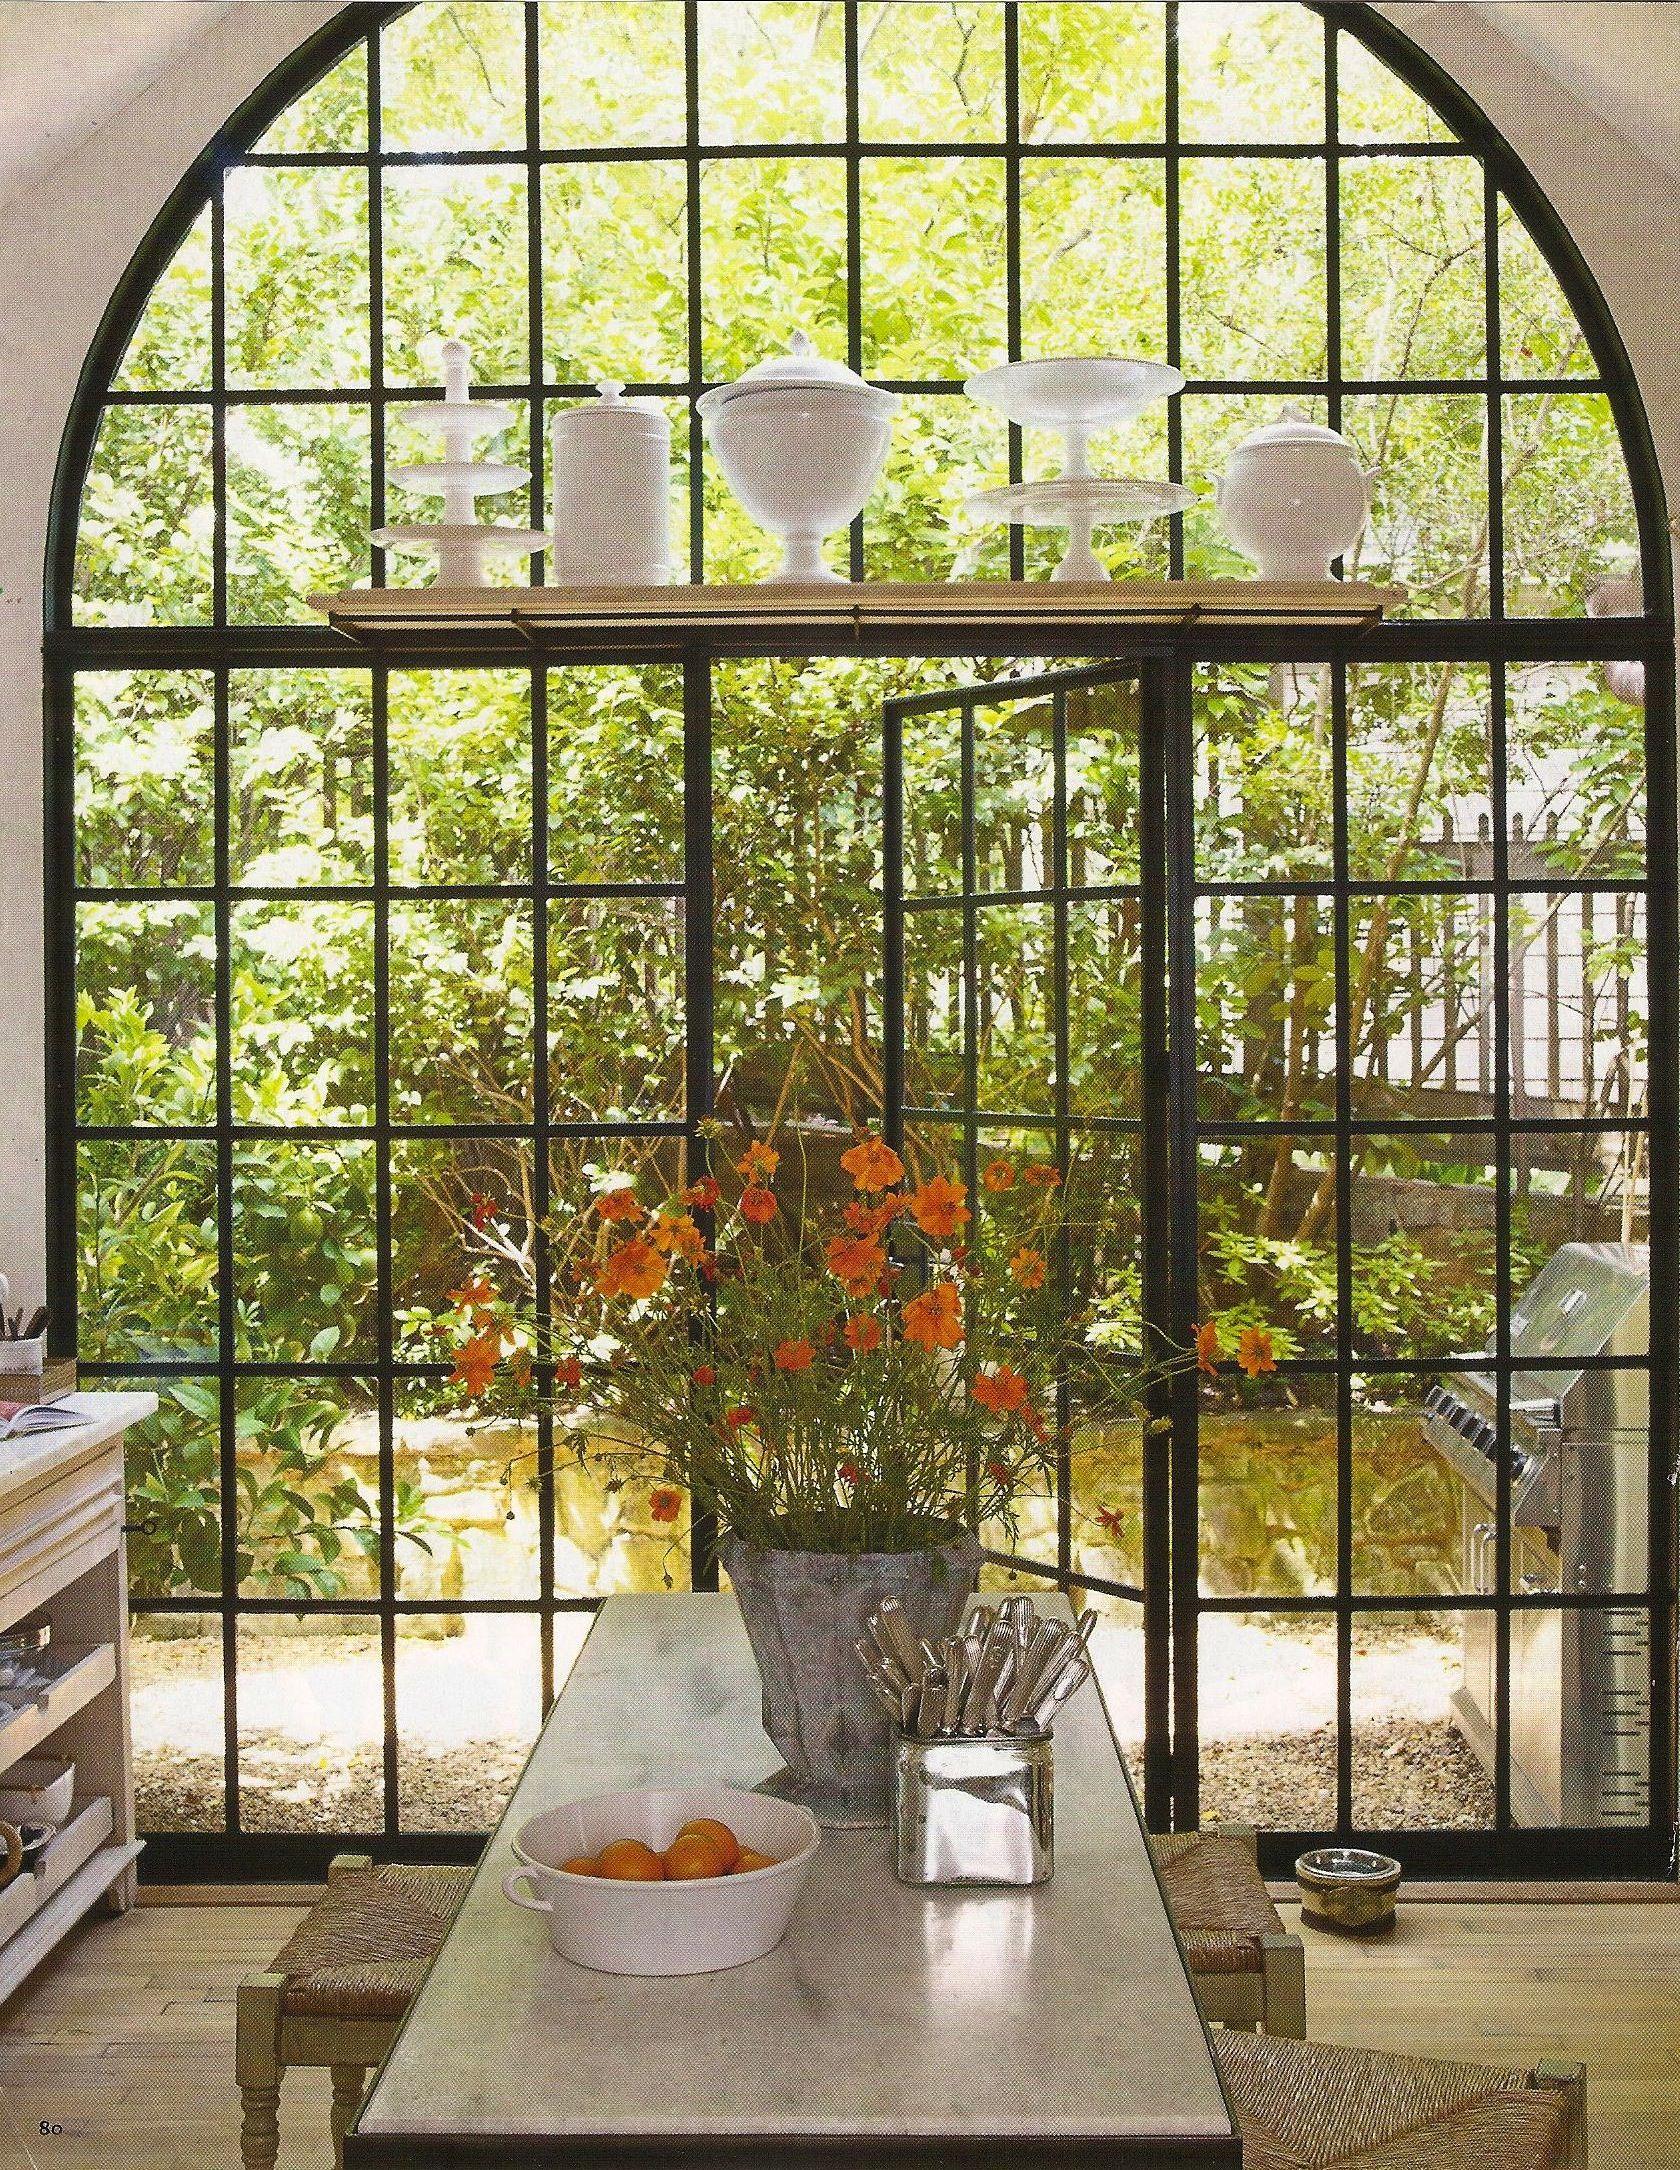 Kitchen bay window exterior  ecffbccdedfbadd  new paintrooms i love